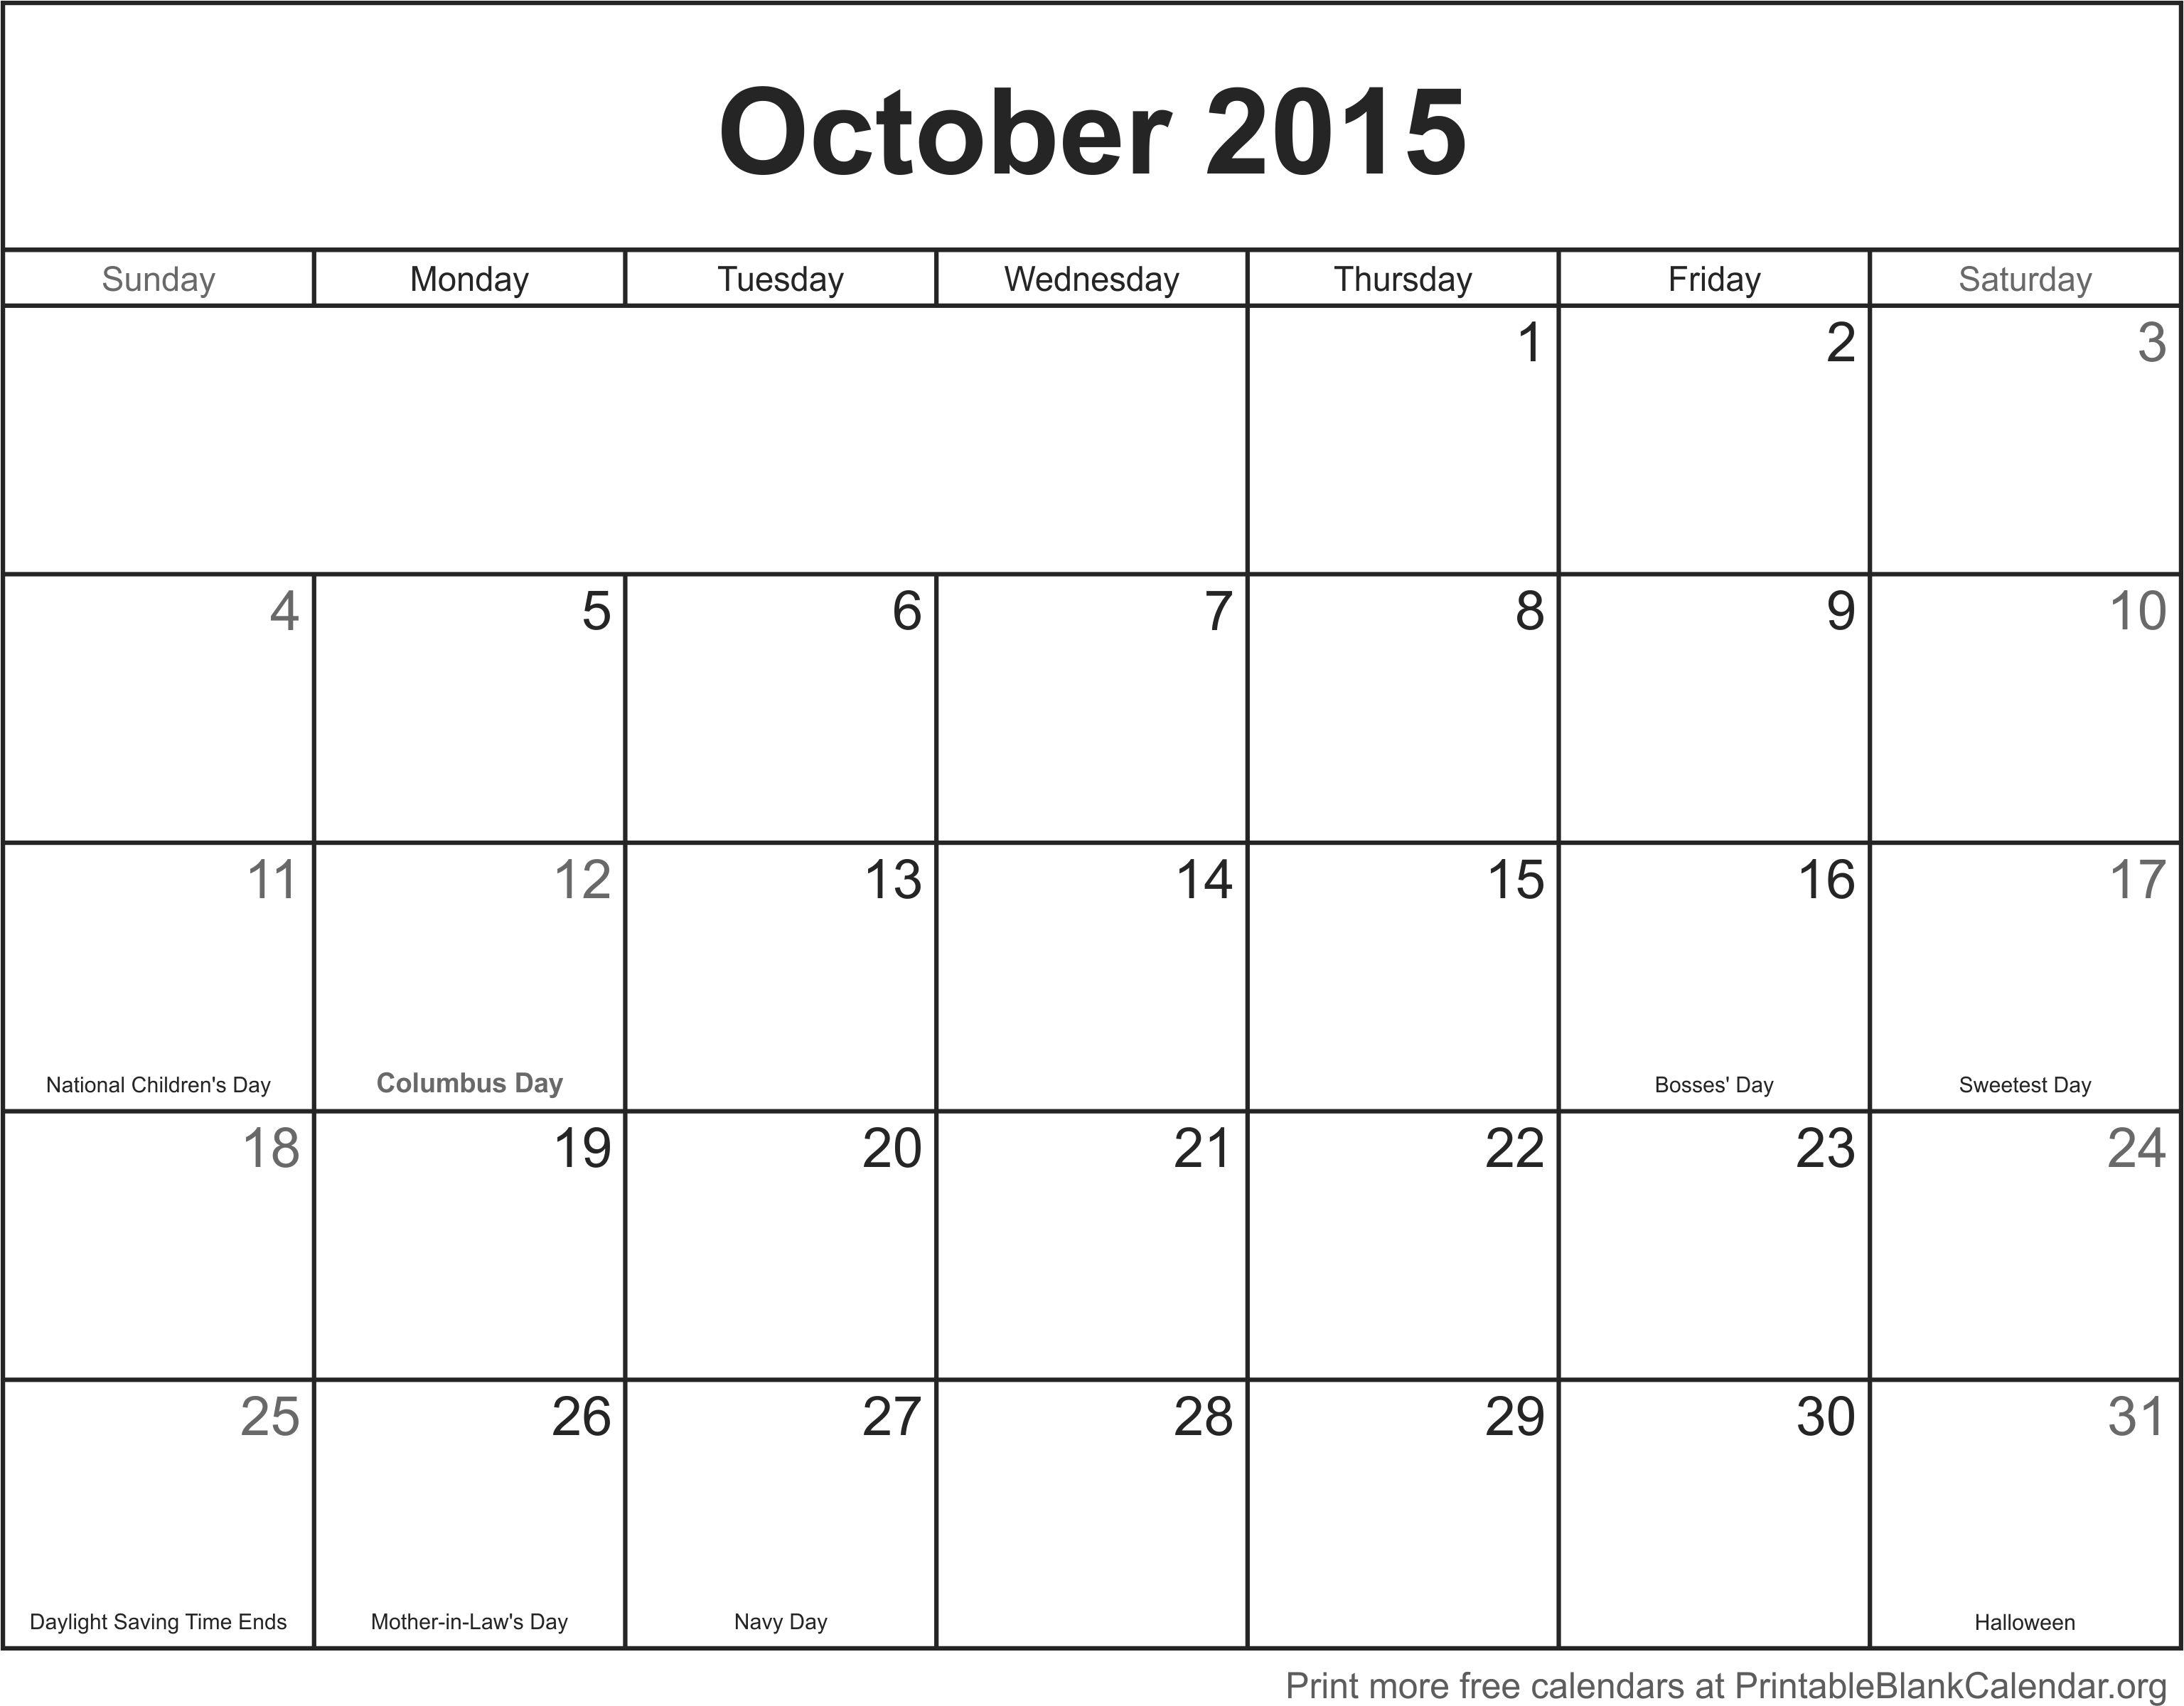 ... 2015 Printable Calendar Template - Printable Blank Calendar.org